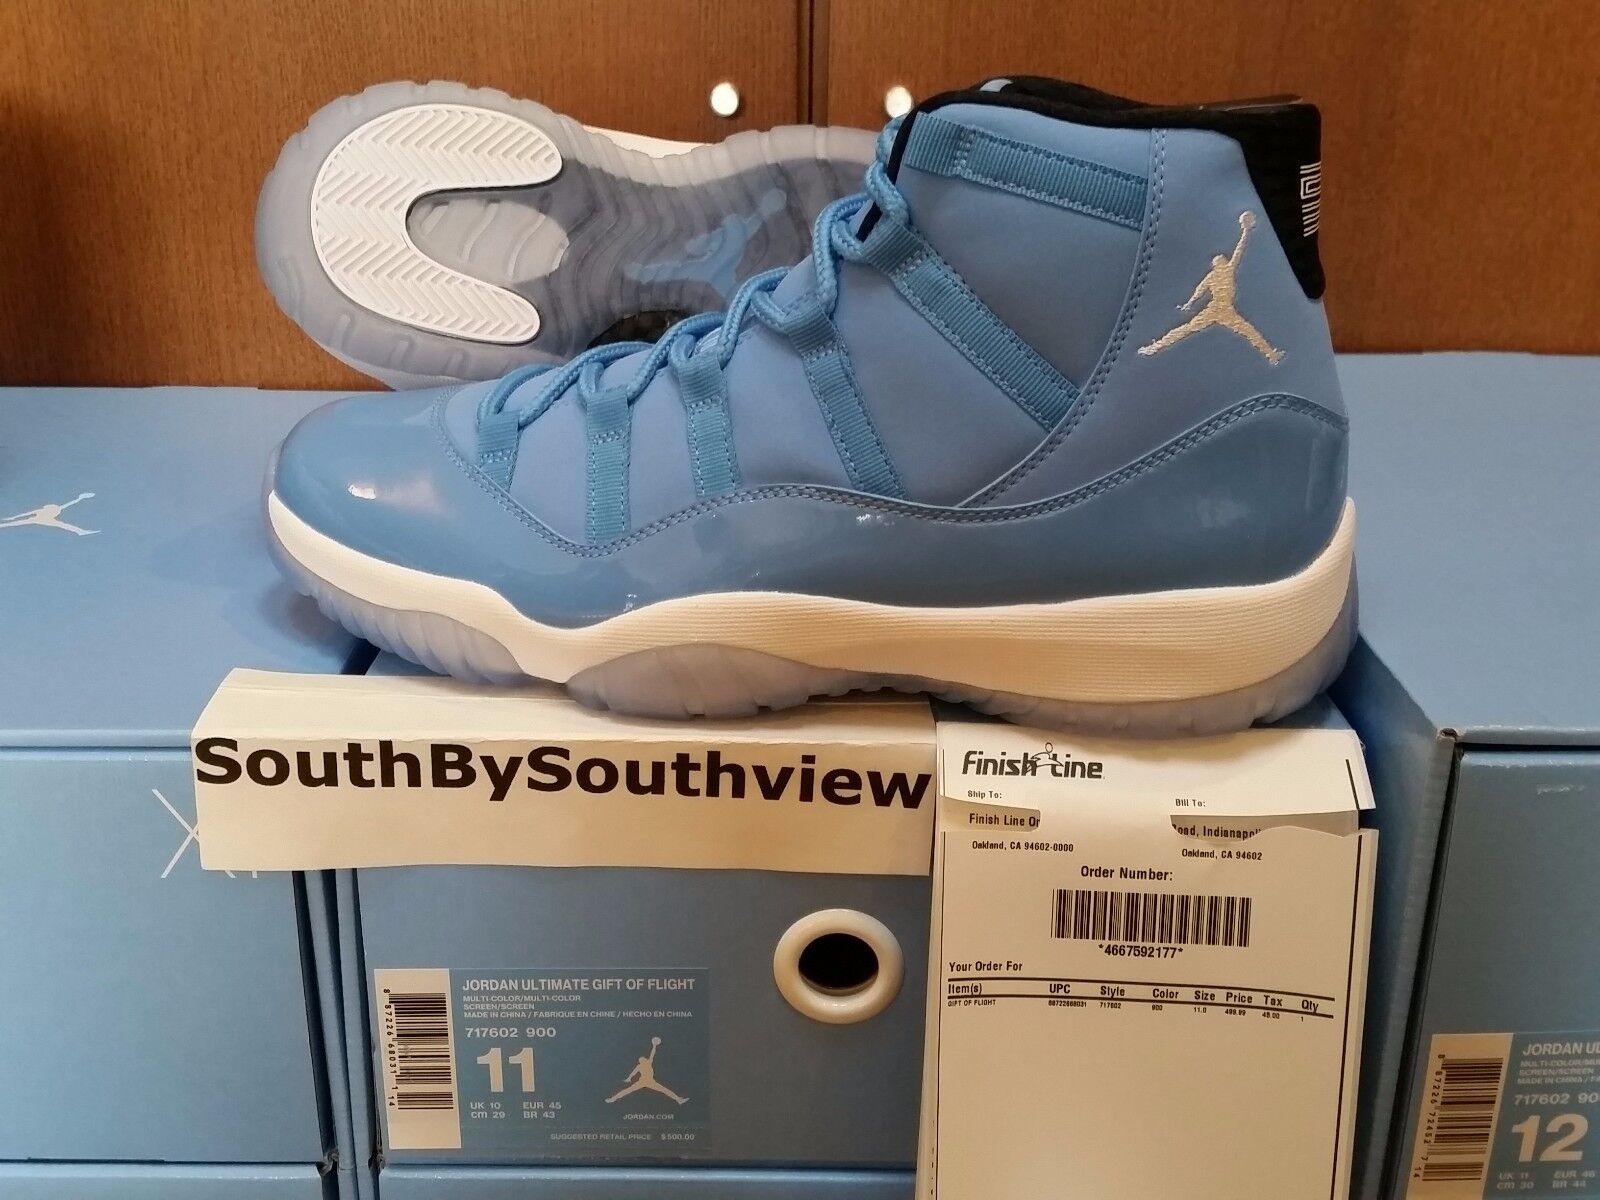 Nike air jordan 11 des blauen w / eingang xi retro - carolina unc - baby 717602-900